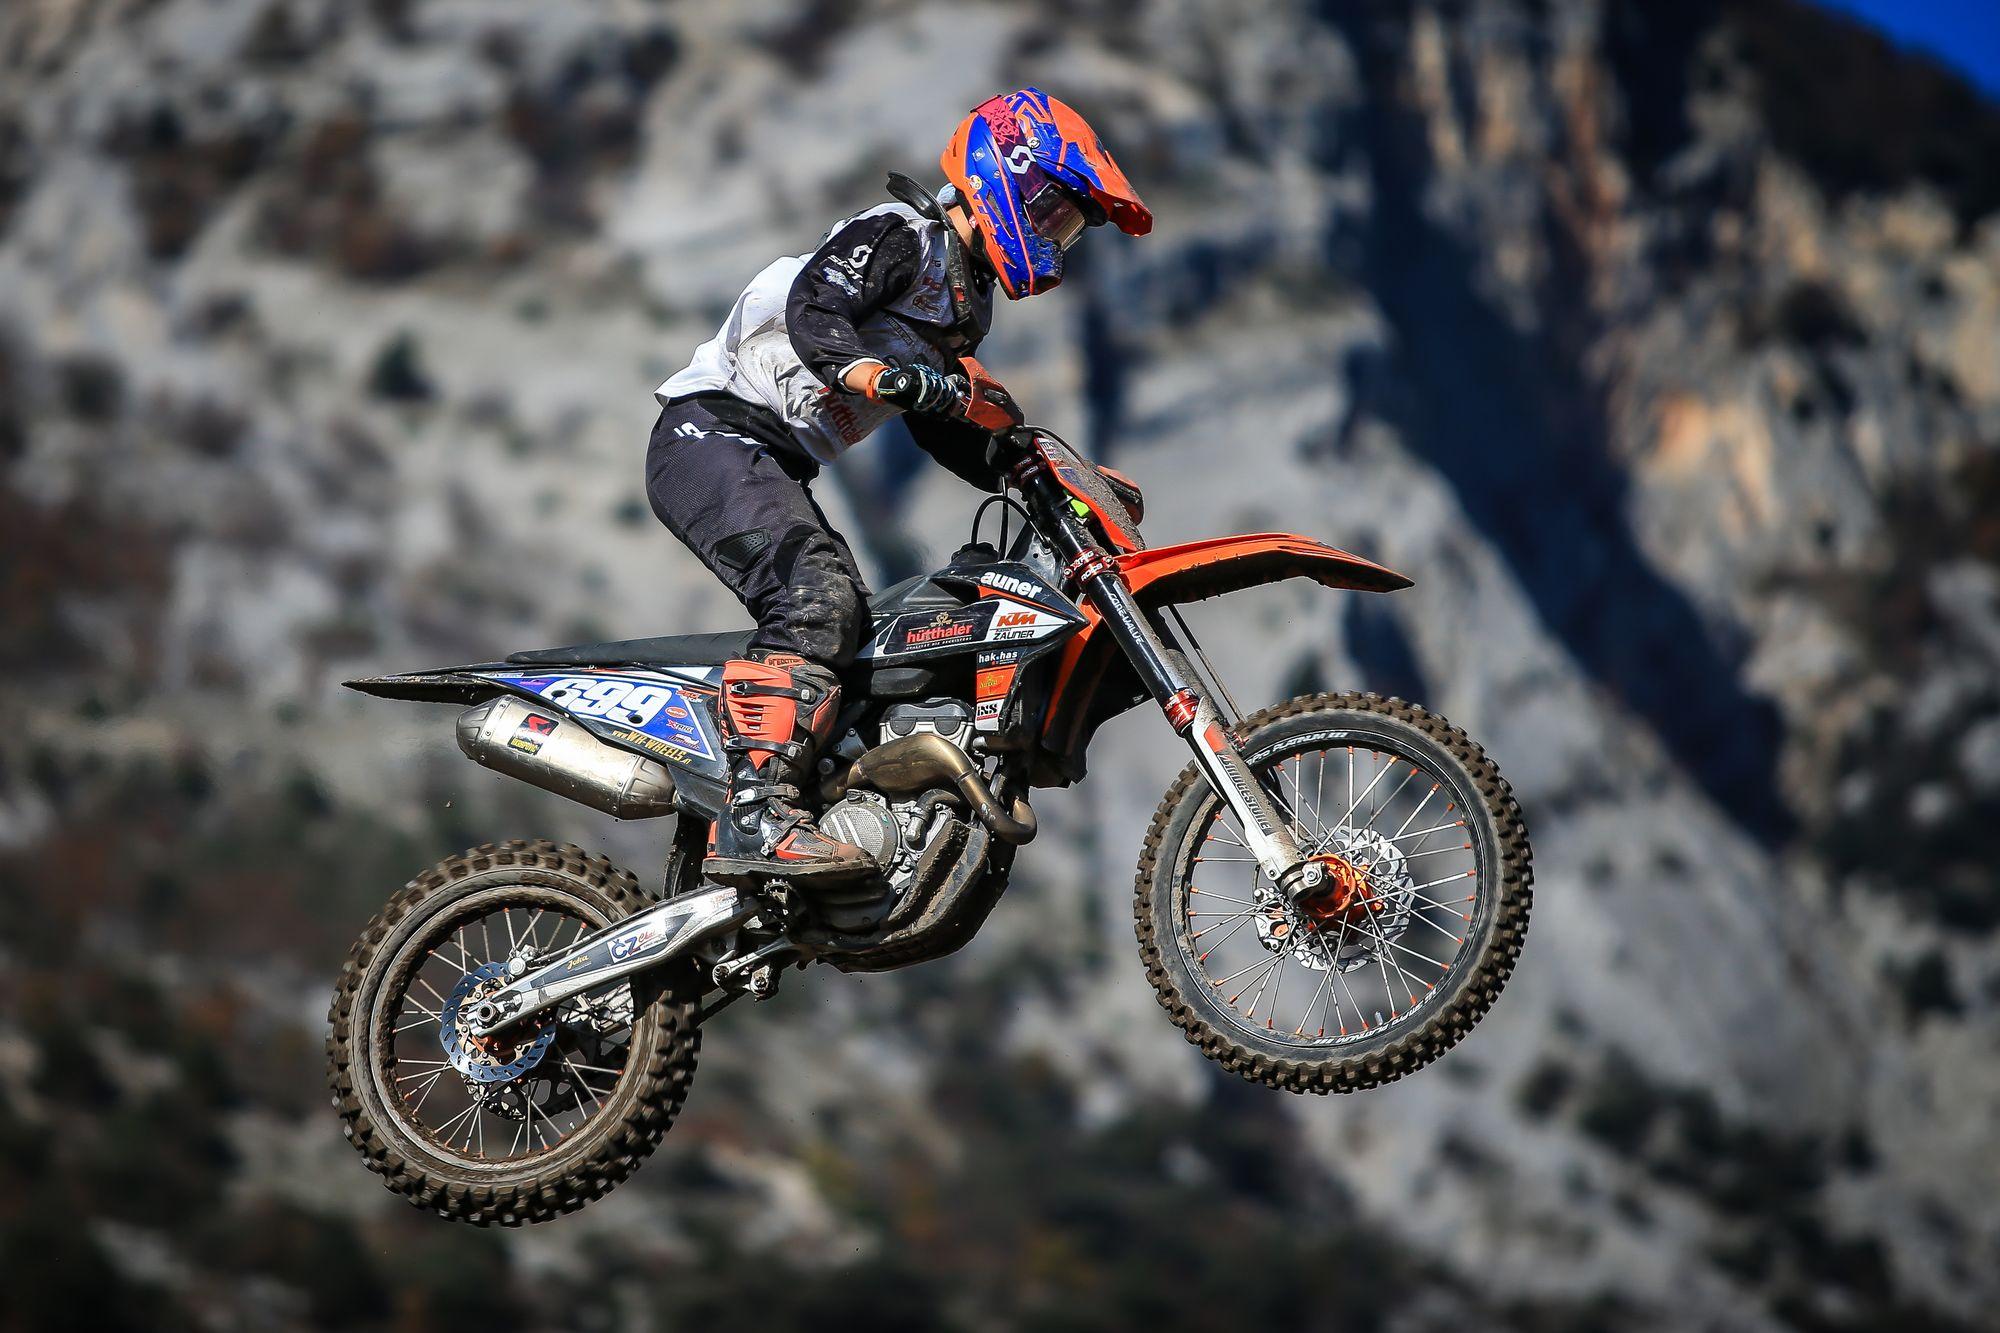 FIM Woman World Championship MXGP of Trentino